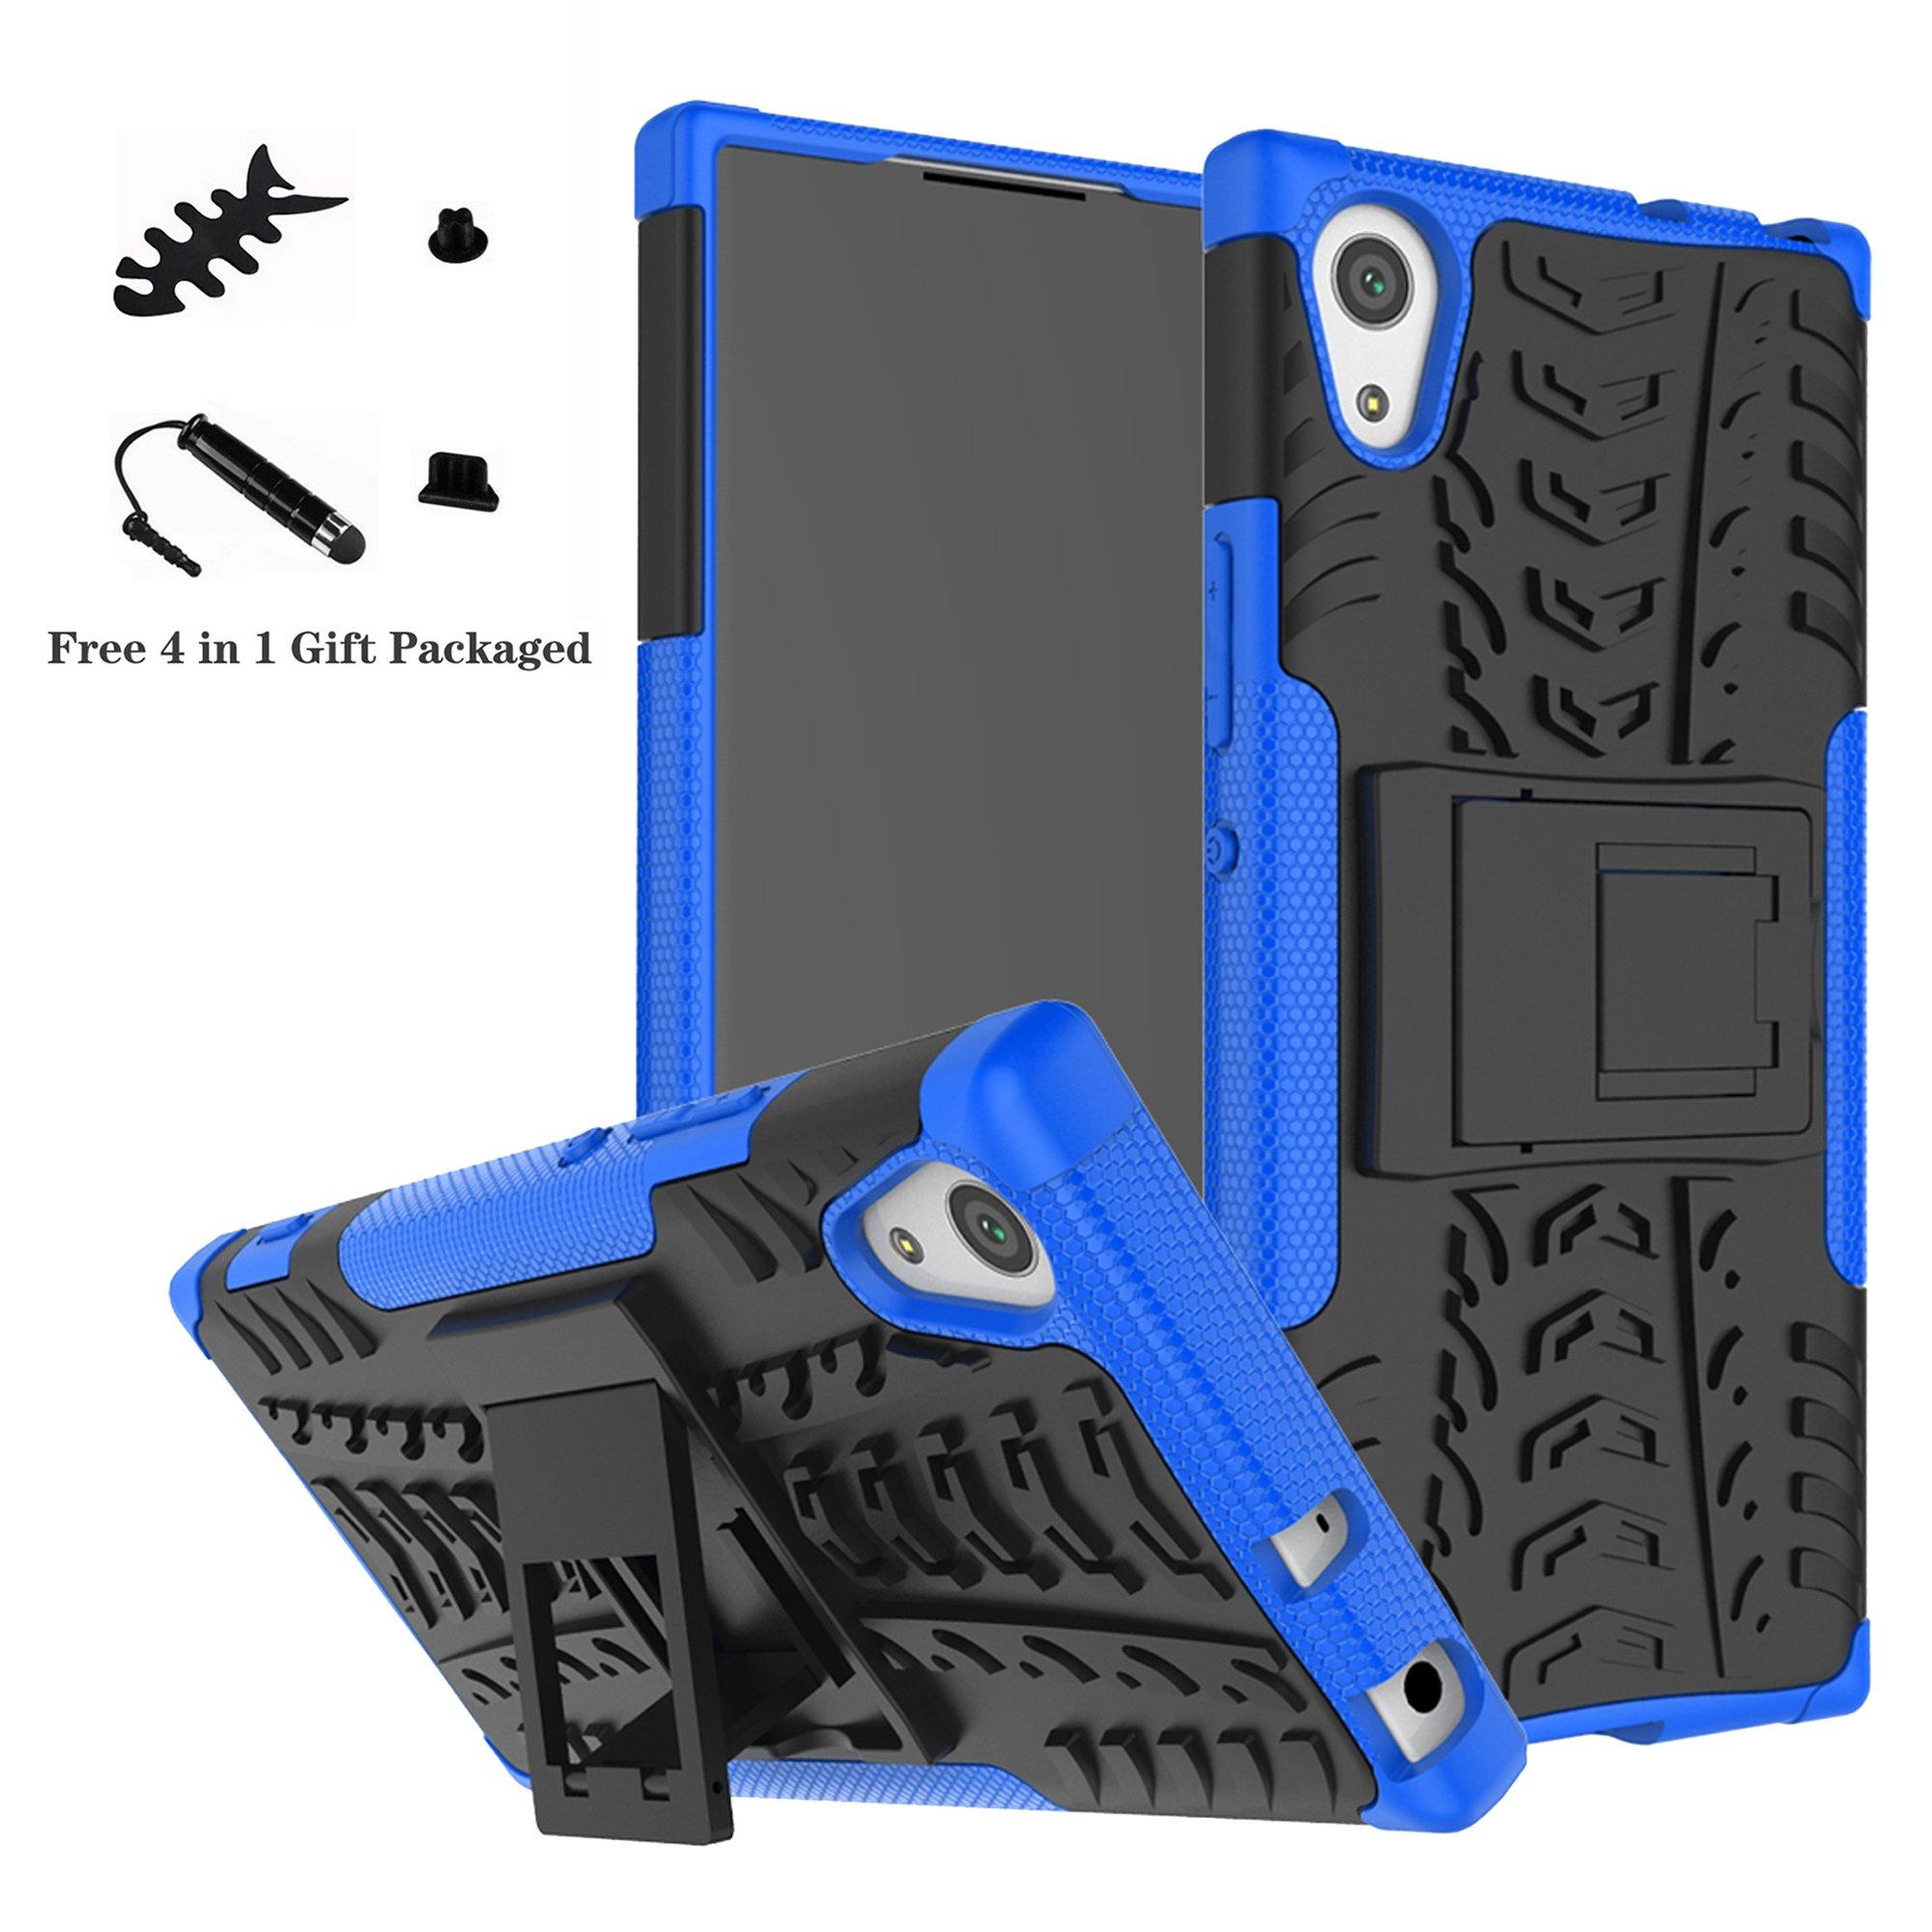 LiuShan Sony XA1 Funda, Heavy Duty Silicona Híbrida Rugged Armor Soporte Cáscara de Cubierta Protectora de Doble Capa Caso para Sony Xperia XA1 Smartphone,Azul: Amazon.es: Electrónica